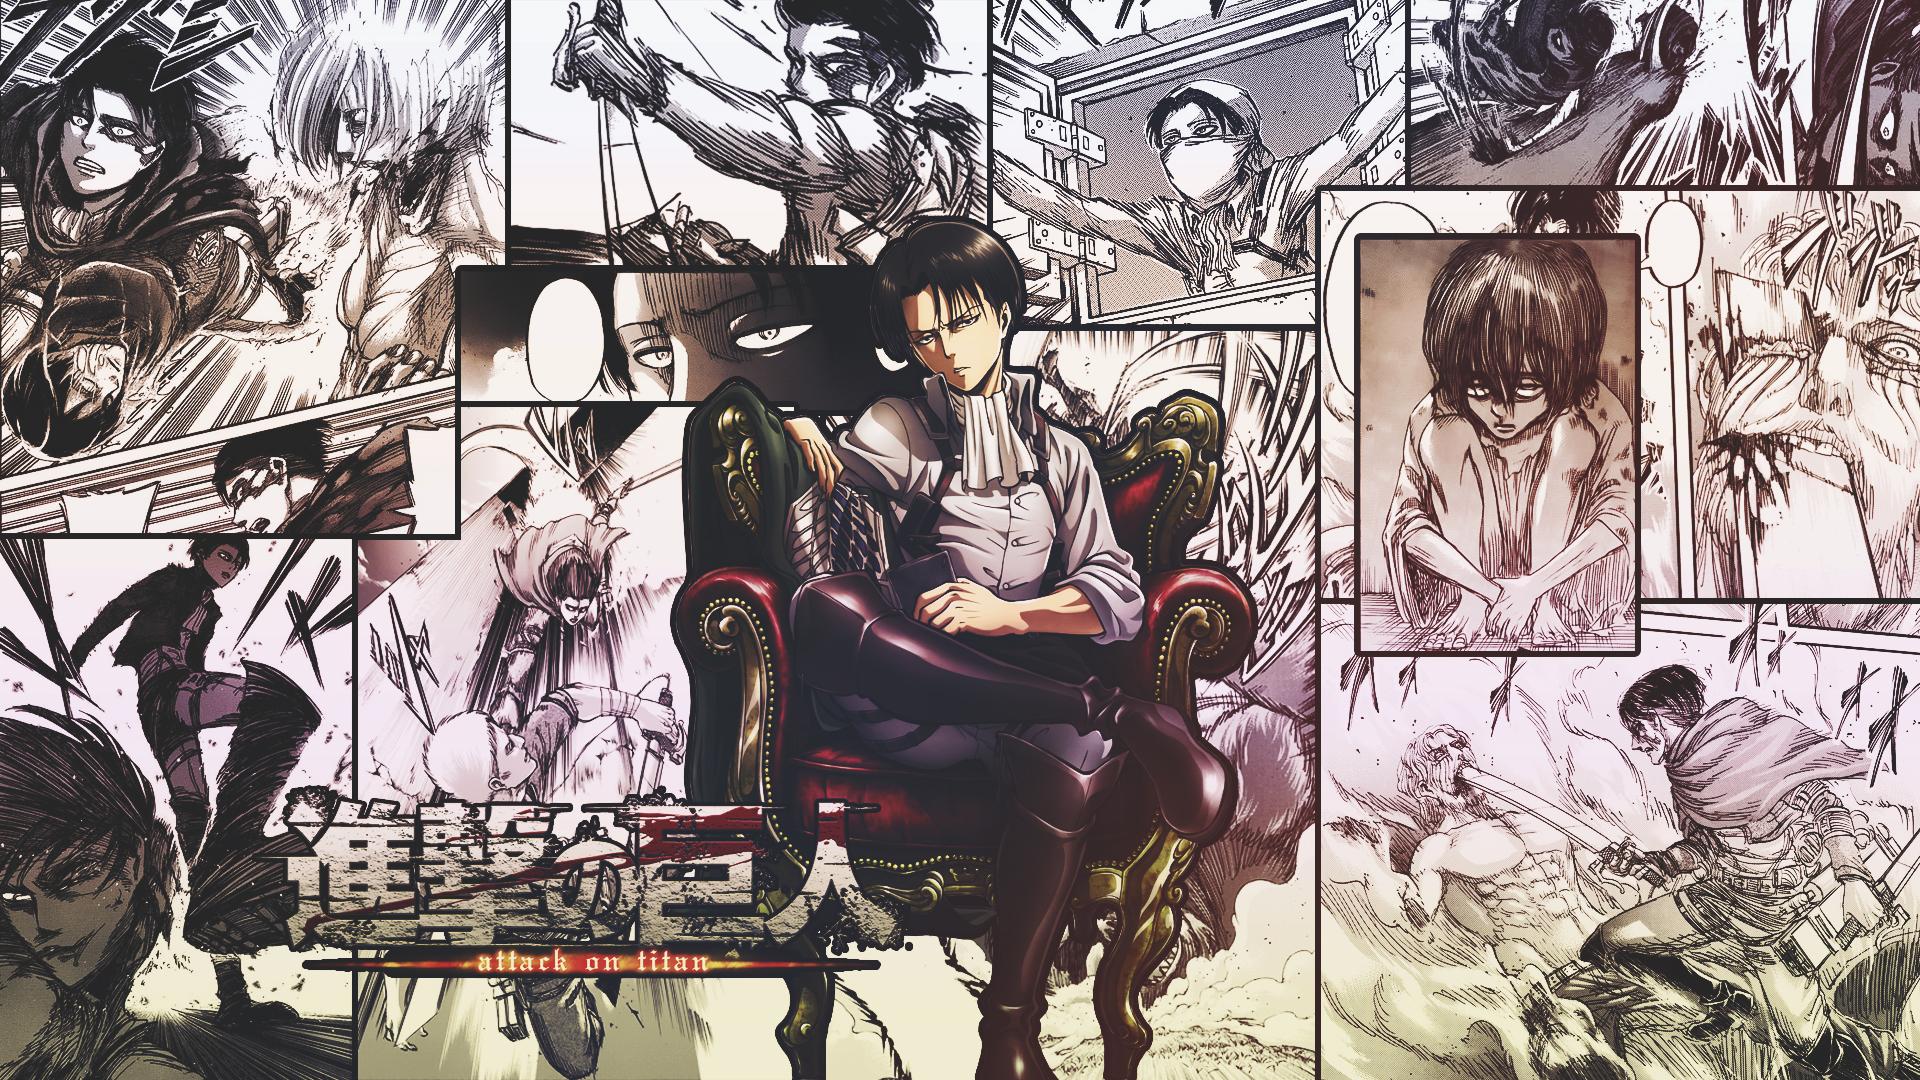 Wallpaper Shingeki No Kyojin Levi Ackerman Collage Comics Manga Speech Bubble Throne Frontal View 1920x1080 Hk64 1969105 Hd Wallpapers Wallhere